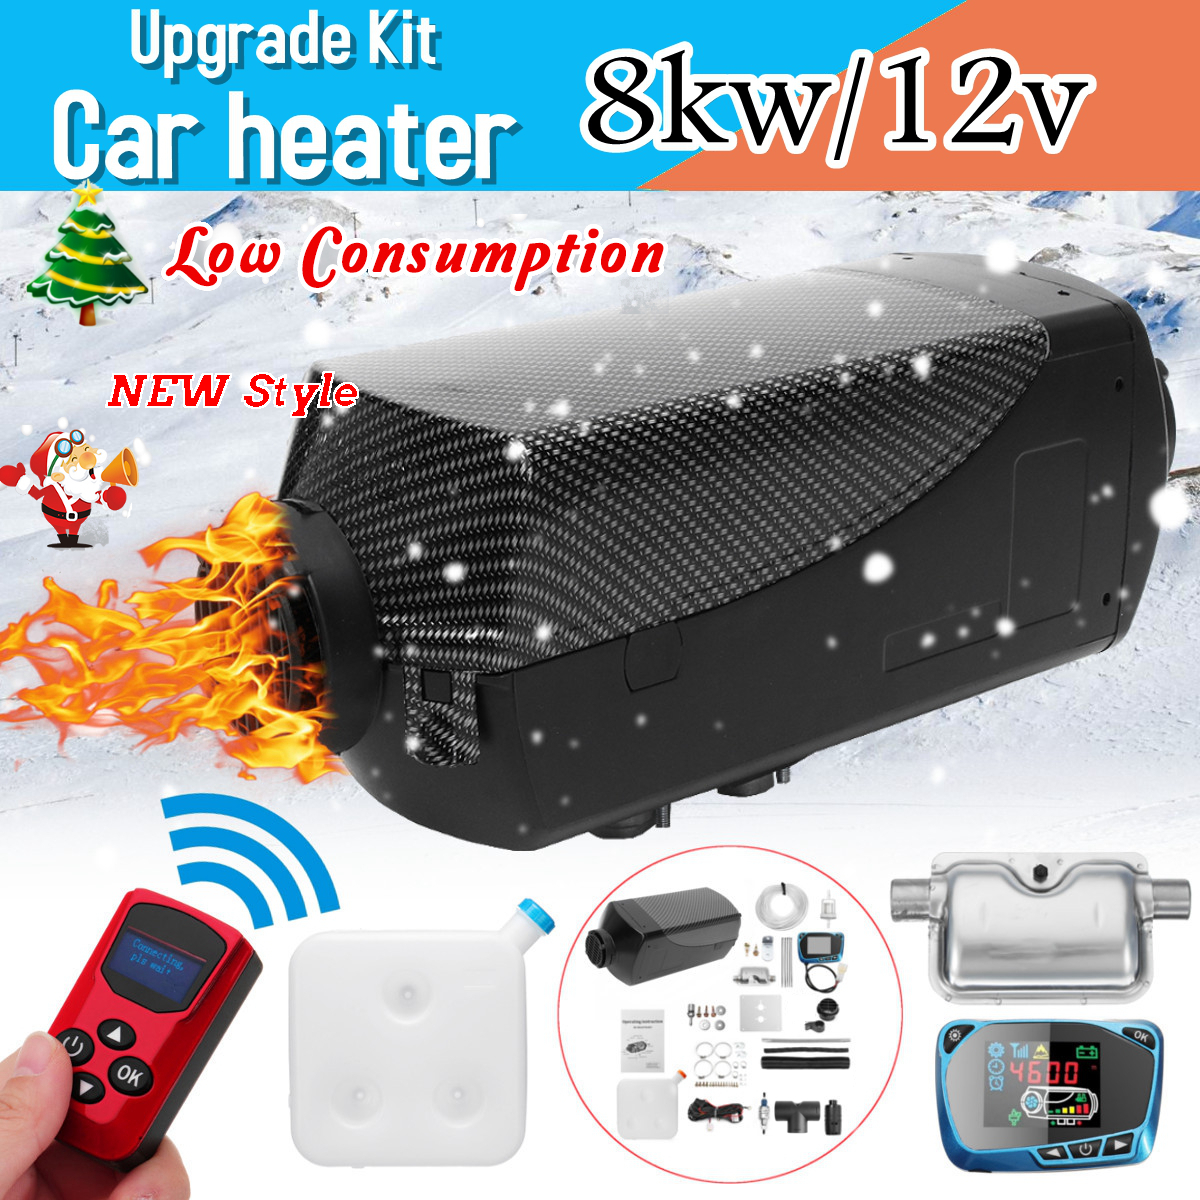 8000 w ar diesels aquecedor 8kw 12 v aquecedor de carro para caminhões motor-casas barcos ônibus + lcd monitor interruptor + controle remoto + silenciador